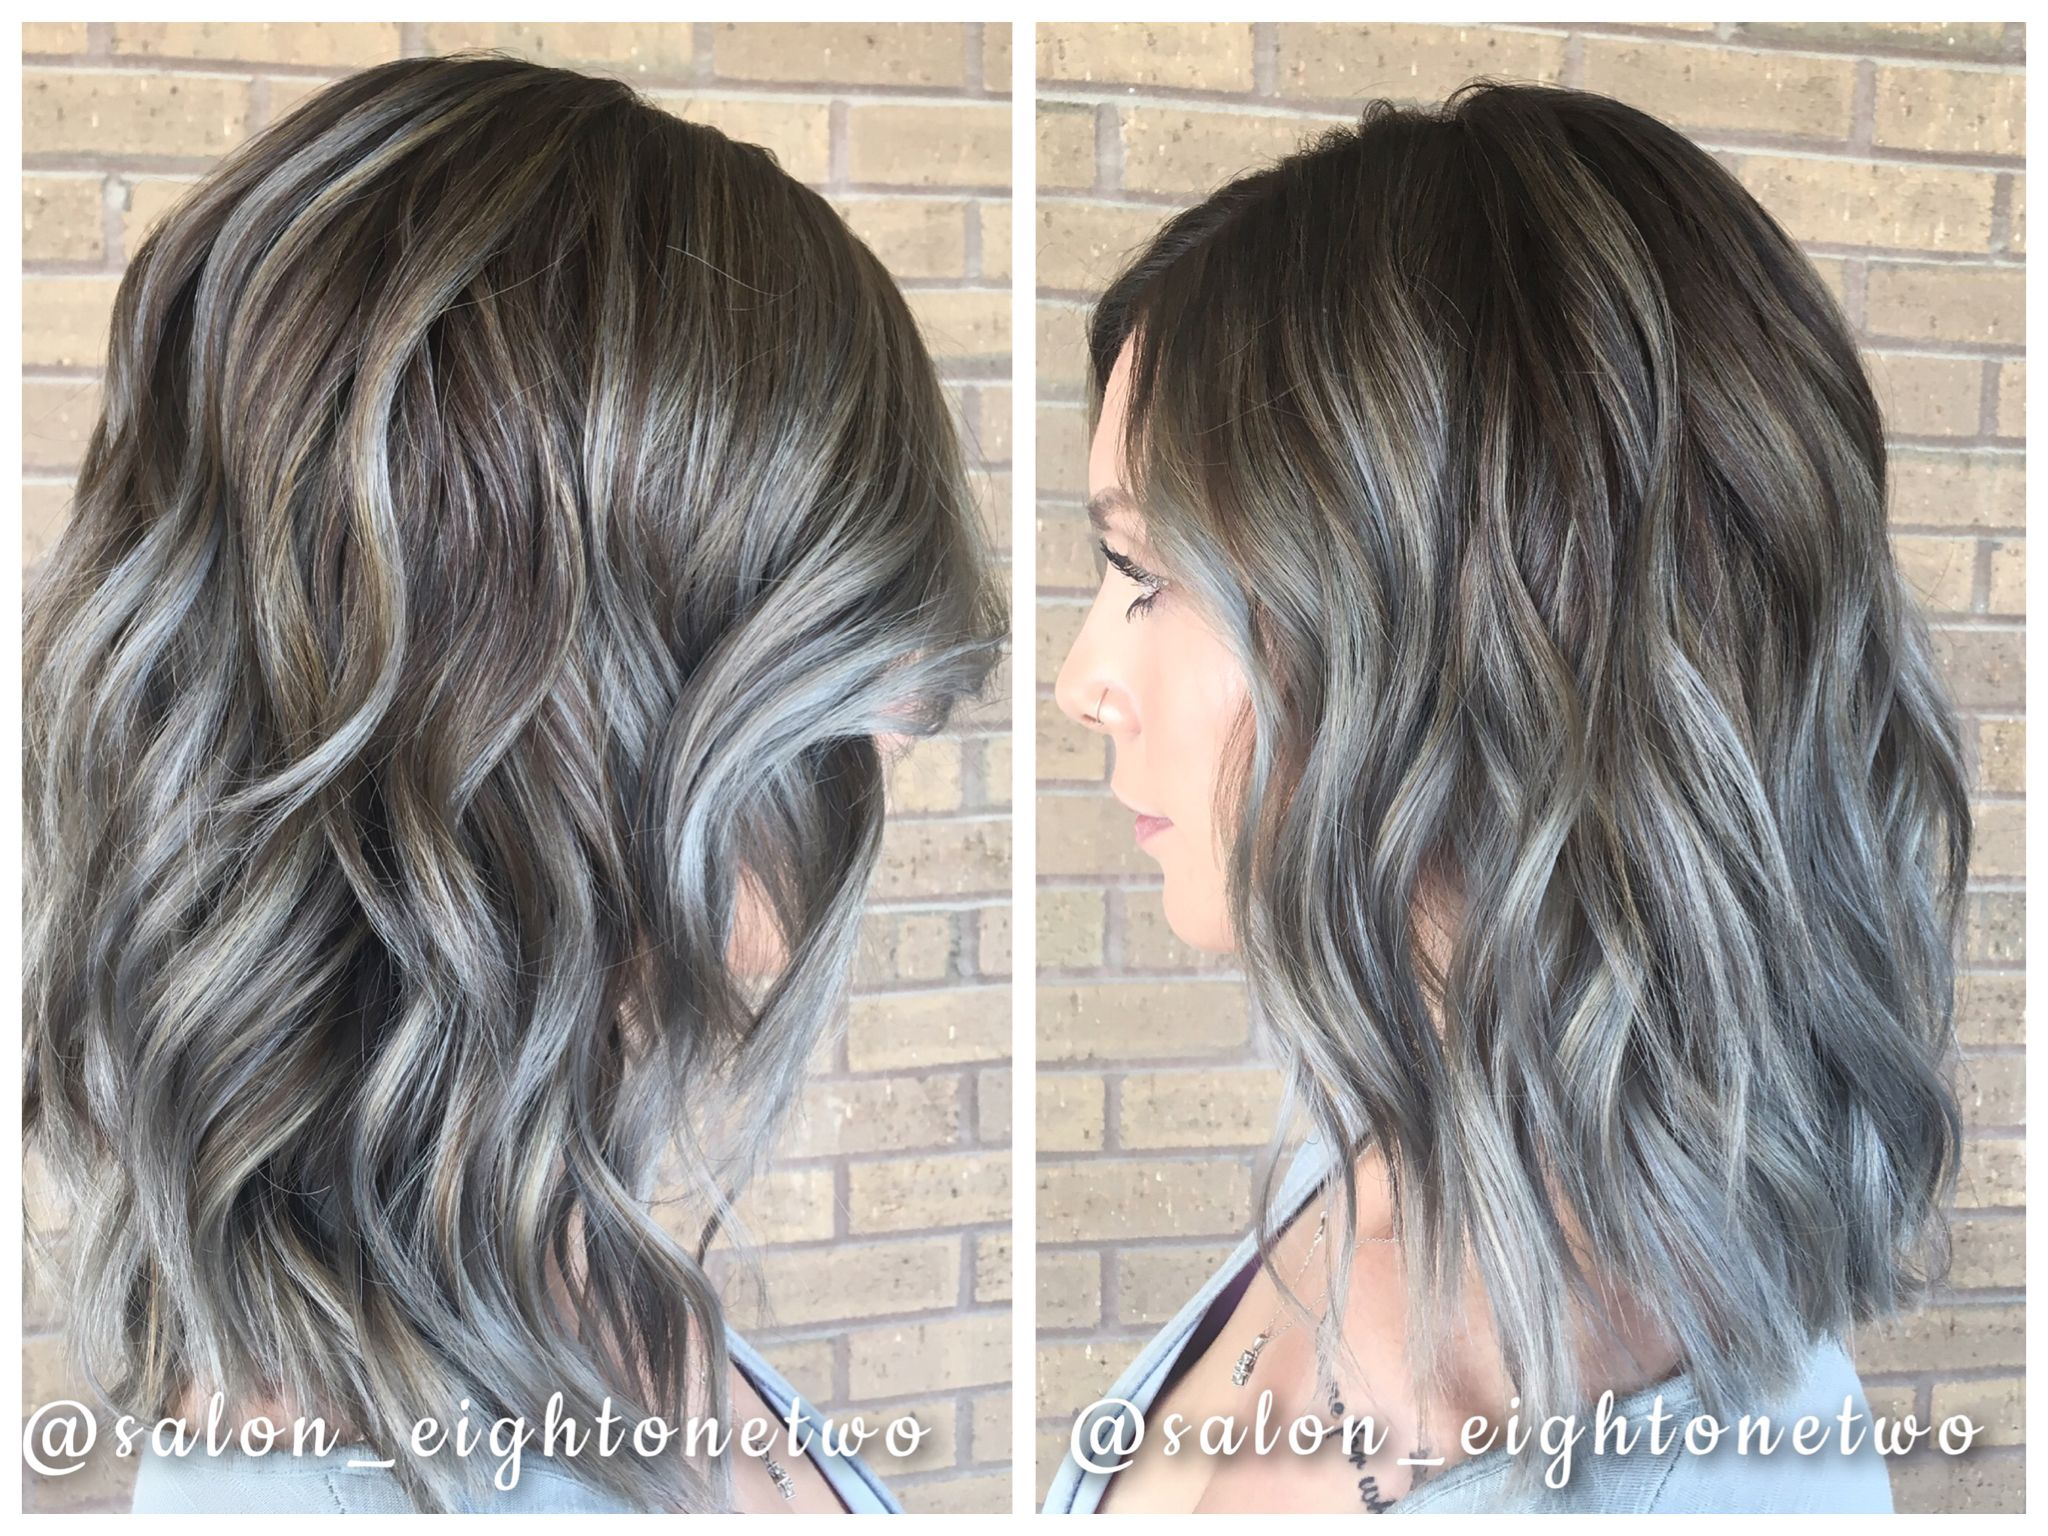 Balayage Red Hair Fall Hair Blonde Hair Highlights Grey Hair Beachy Waves Hair Color Trendy Hair Color Melting Hair Brown Ombre Hair Blonde Hair Color